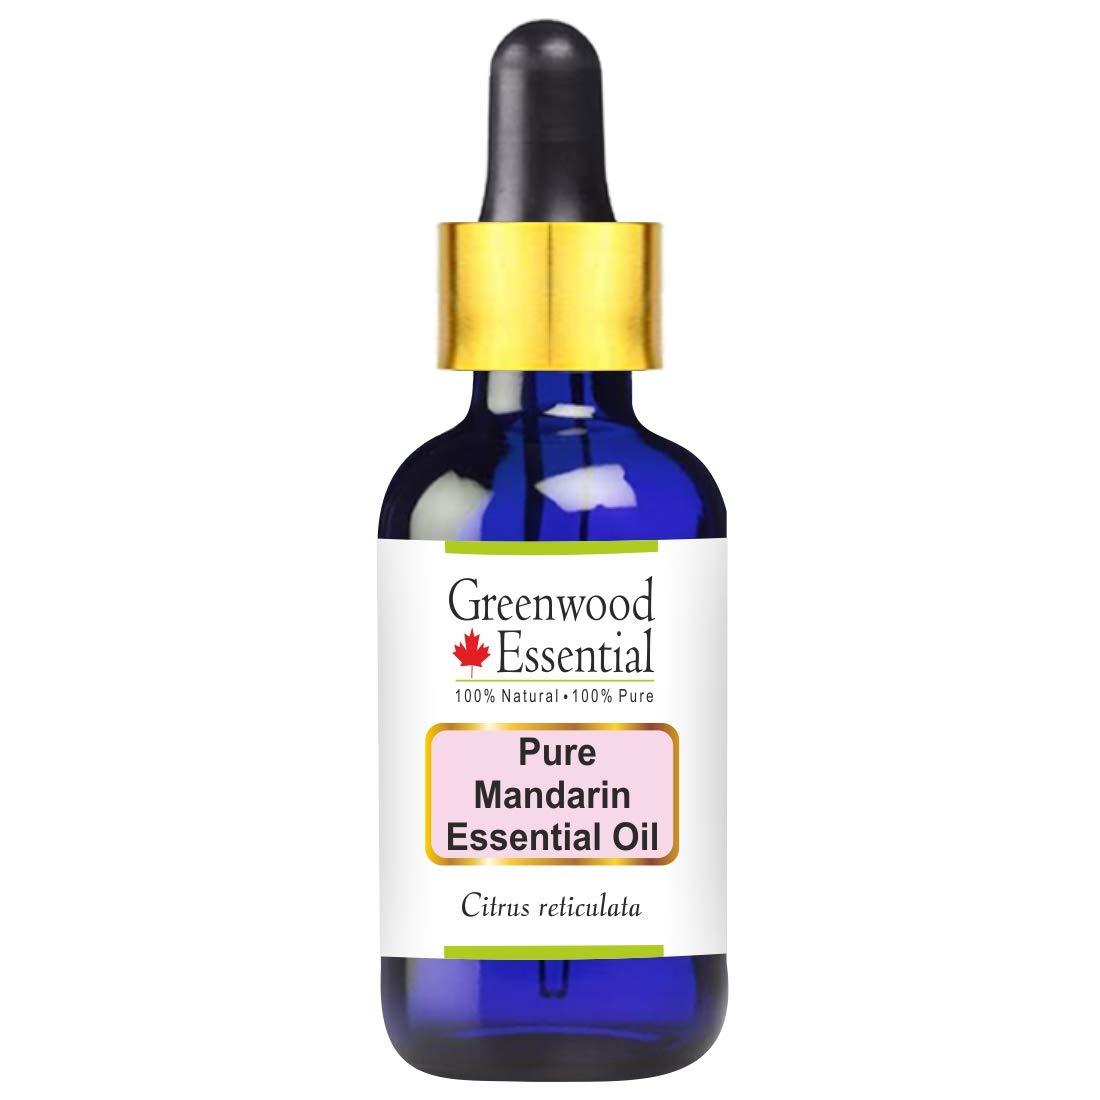 Greenwood Essential Pure Mandarin Essential Oil (Citrus reticulata) with Glass Dropper Premium Therapeutic Grade for Hair, Skin & Aromatherapy 50ml (1.69 oz)